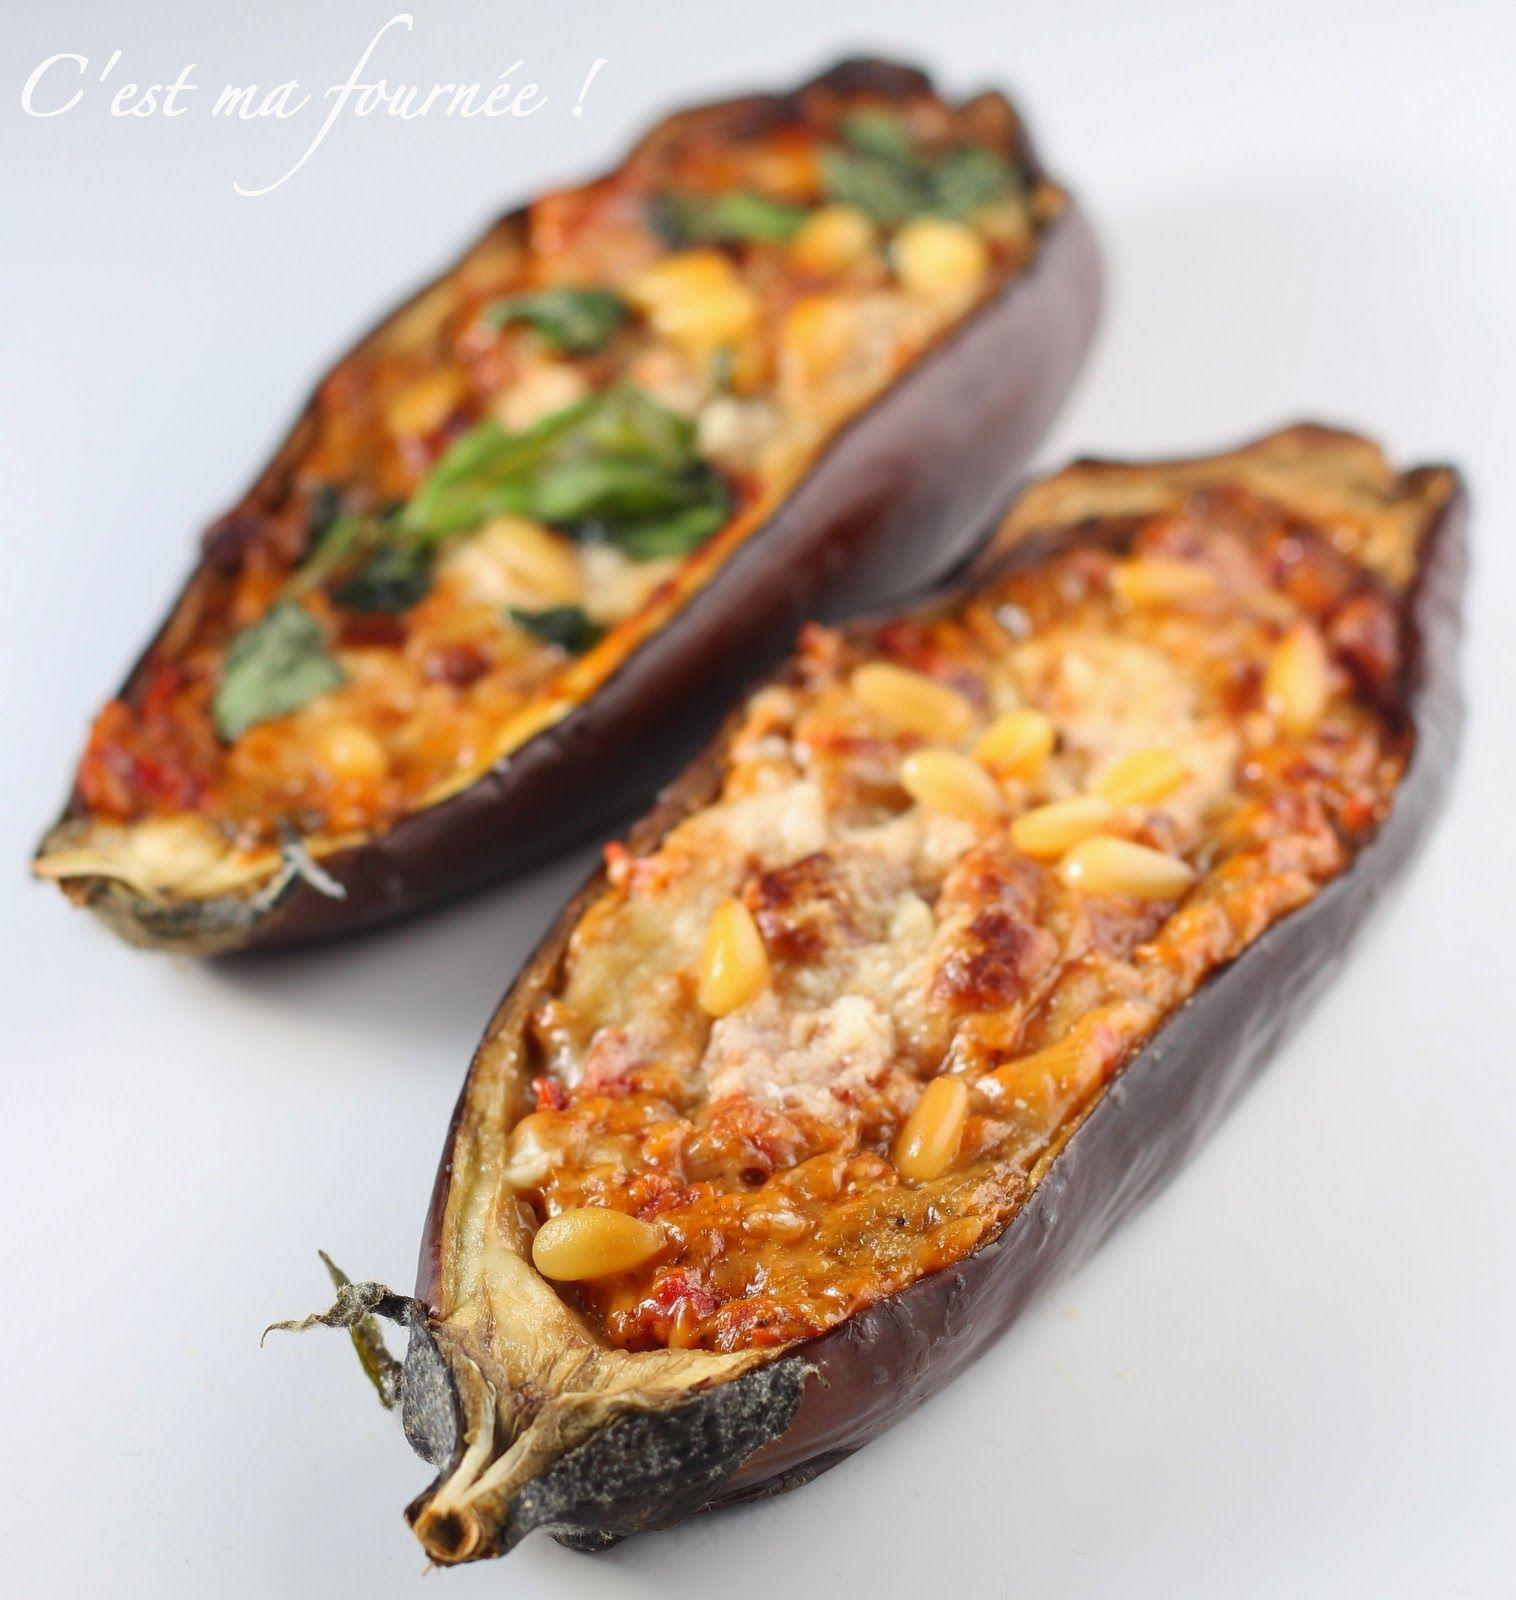 les aubergines farcies sans viande c 39 est ma fourn e stuffed eggplant eggplants and meat. Black Bedroom Furniture Sets. Home Design Ideas